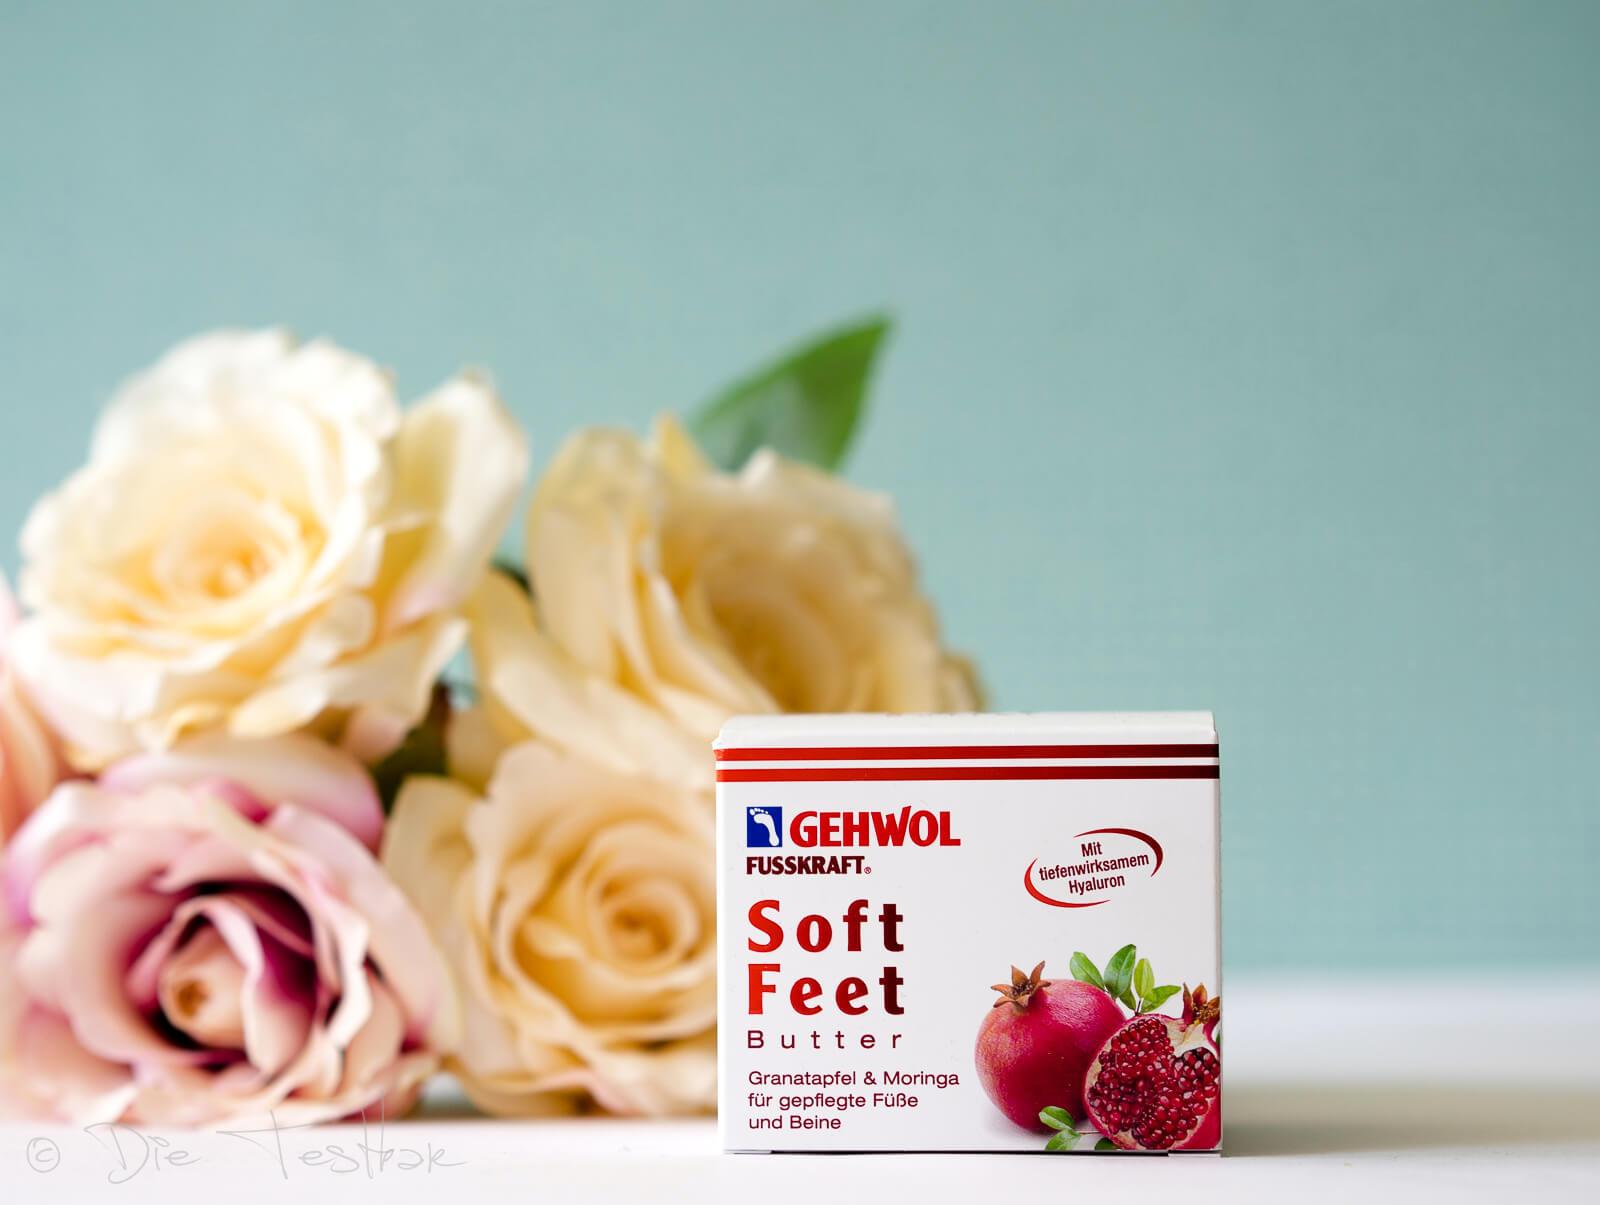 GEHWOL FUSSKRAFT Soft Feet Butter - Granatapfel & Moringa